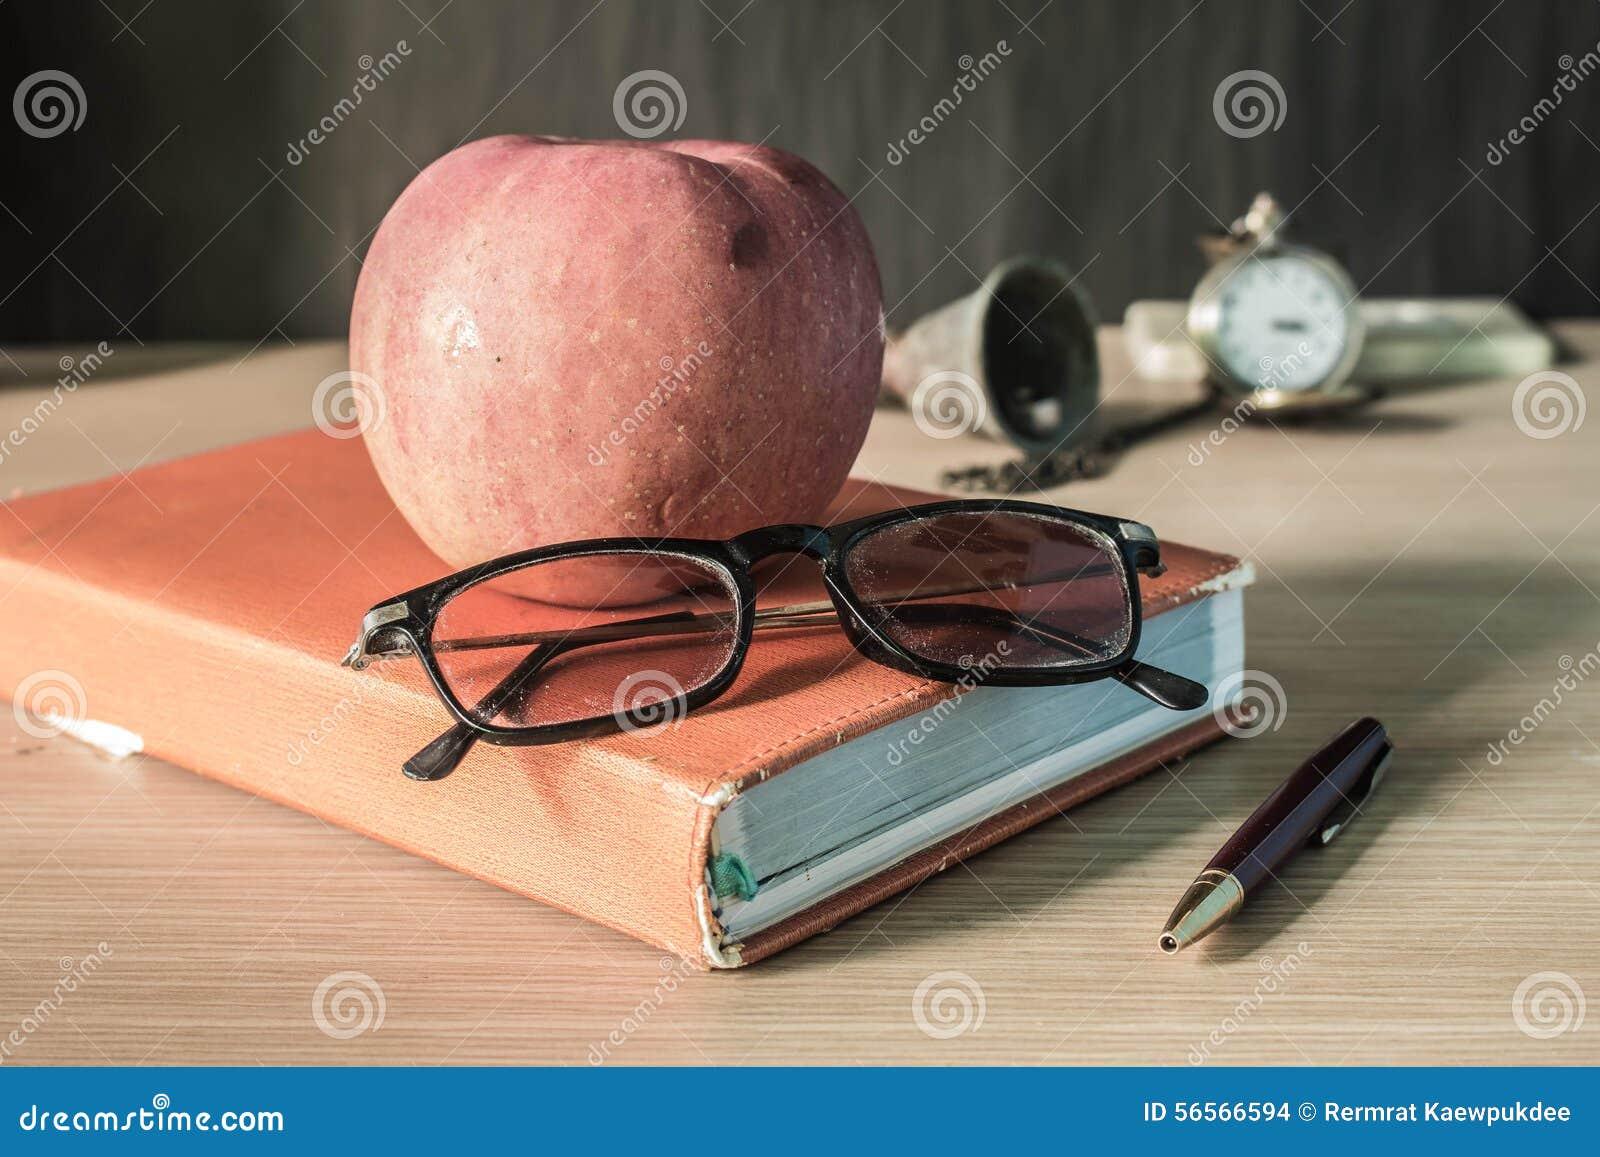 Download Γυαλιά και φρούτα σε έναν στάσιμο Στοκ Εικόνες - εικόνα από γυαλιά, σημείωση: 56566594